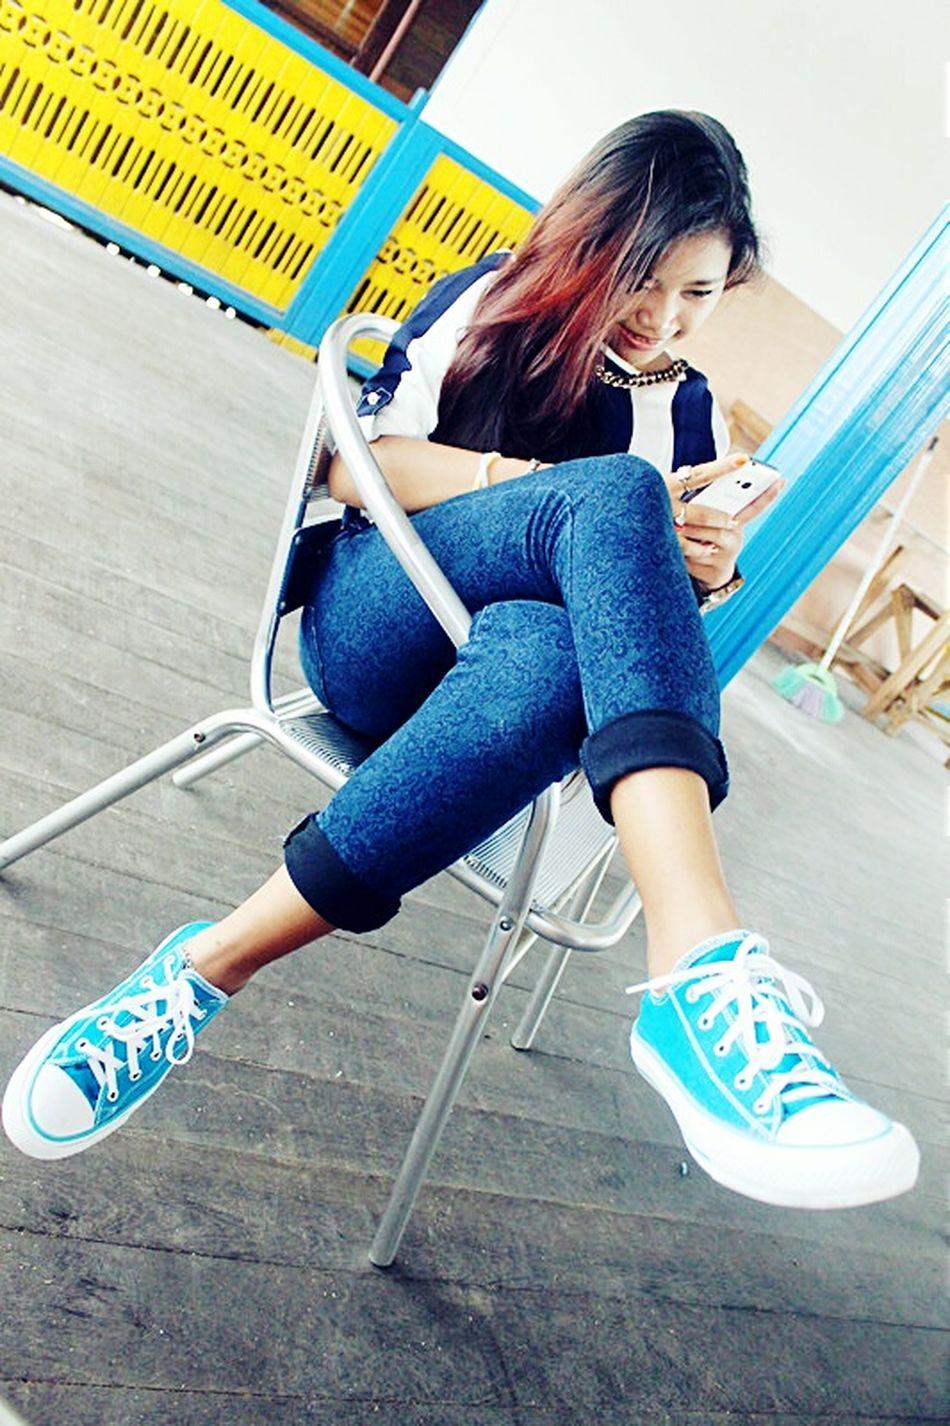 Airood Hi! Taking Photos Enjoying Life Banjarmasinpunya Followme HiEyeEm FollowMe